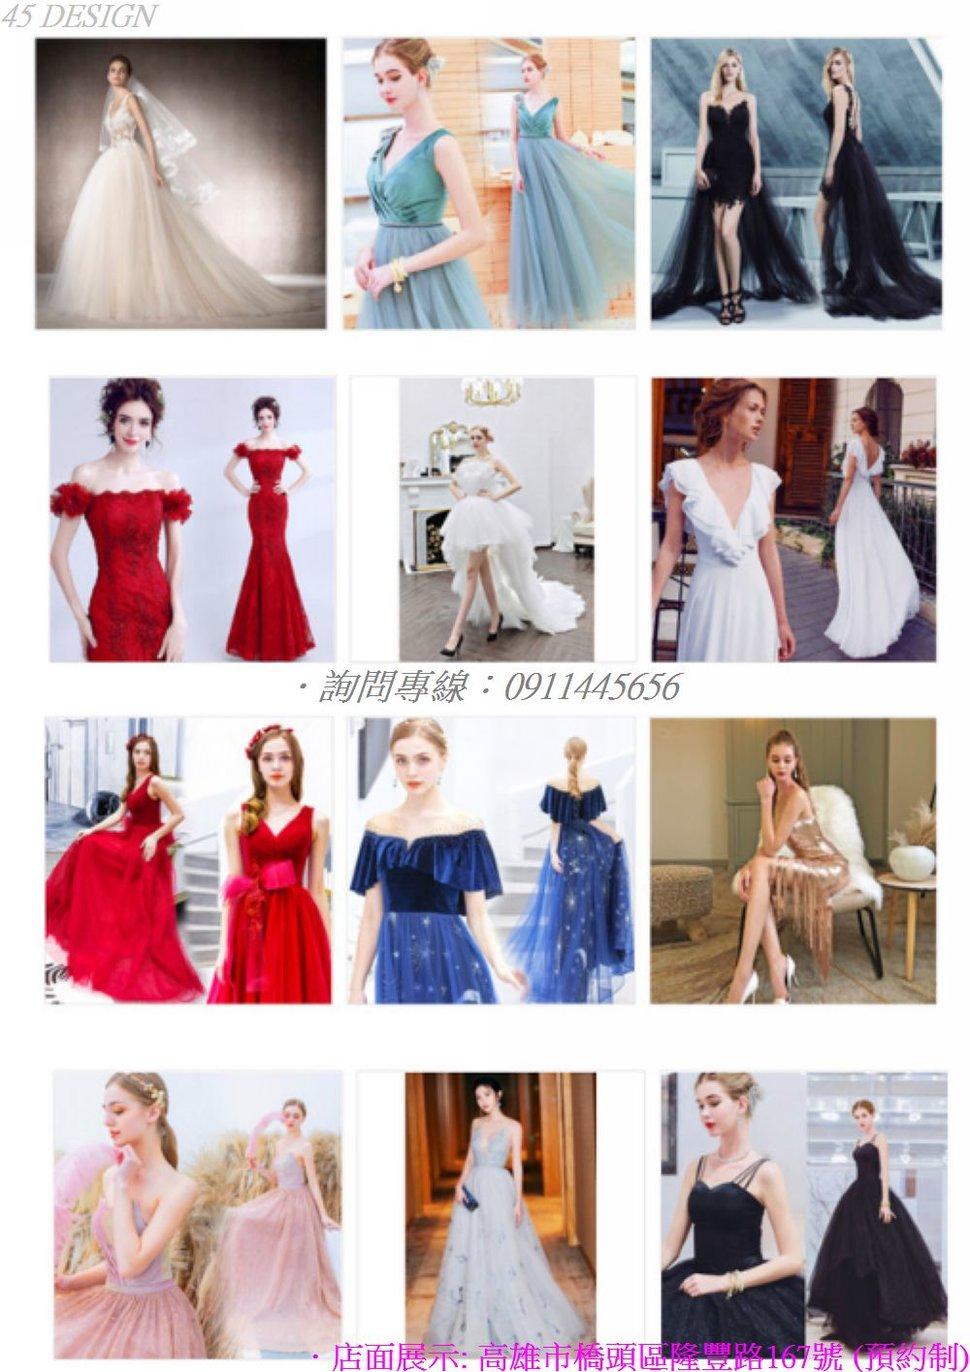 msl19081575CB0081B73743F097EEB7C1569CC8CA - 全台最便宜-45DESIGN四五婚紗禮服《結婚吧》